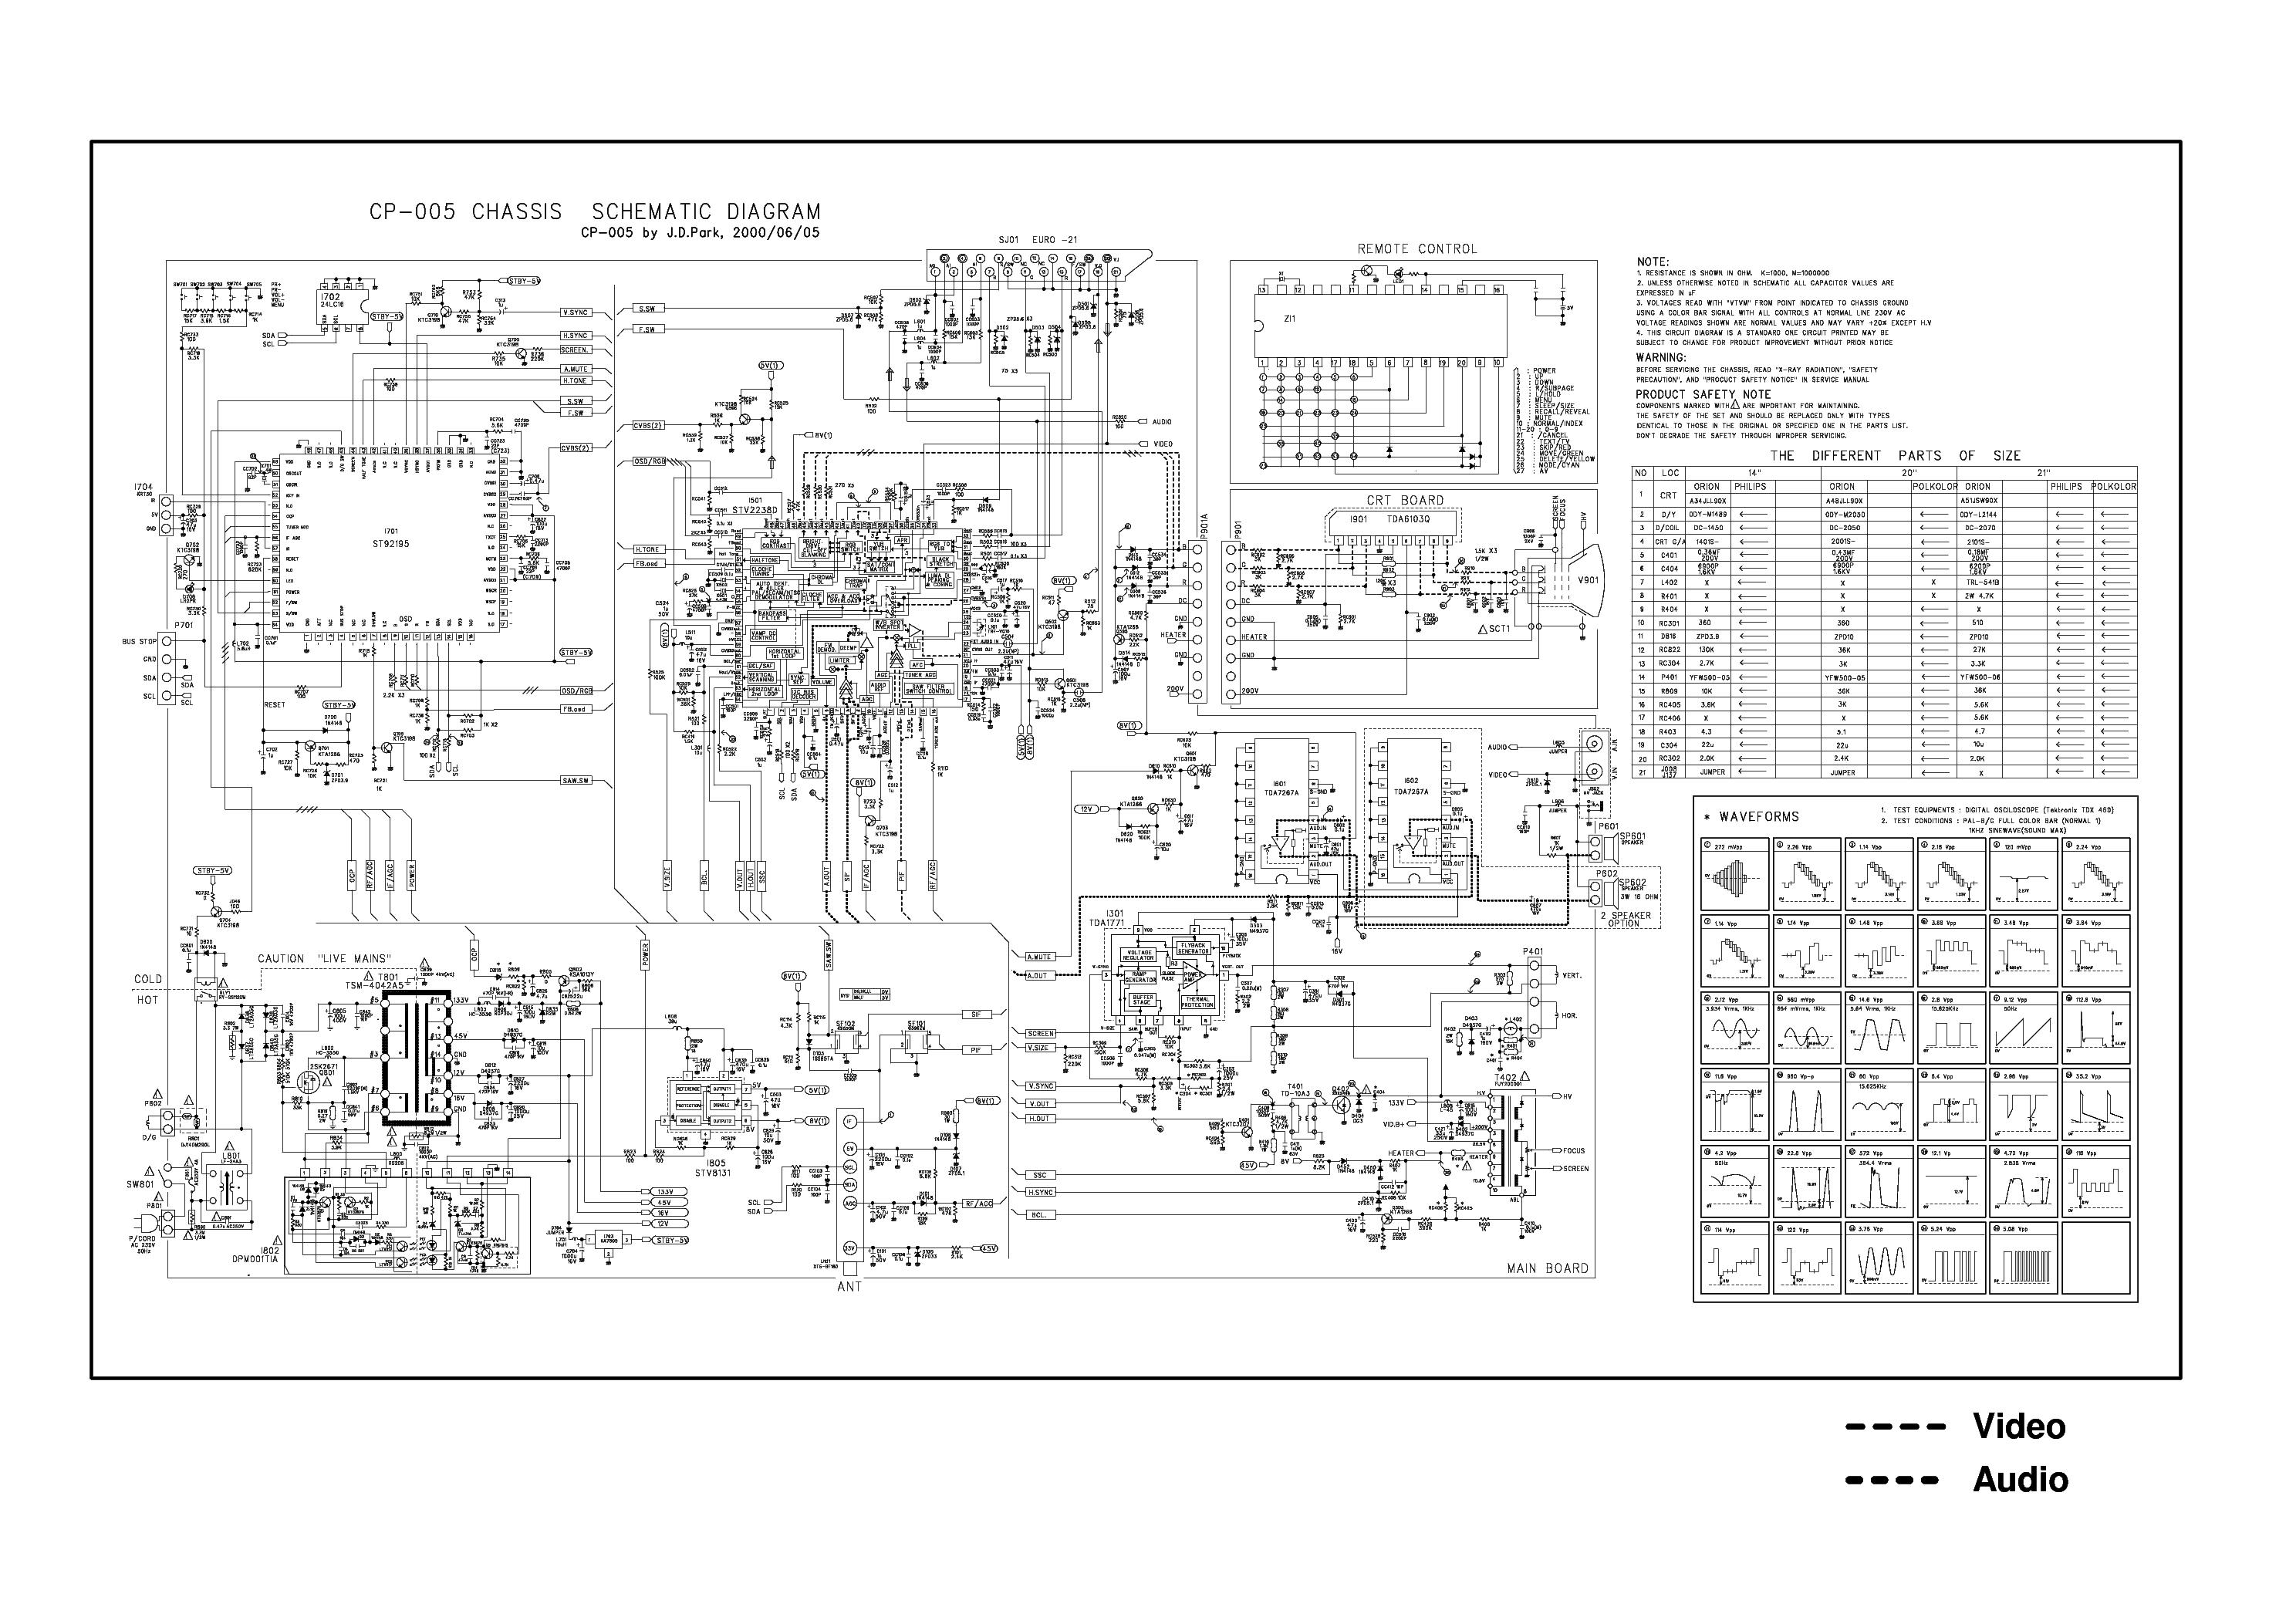 daewoo cp005rajz service manual download  schematics